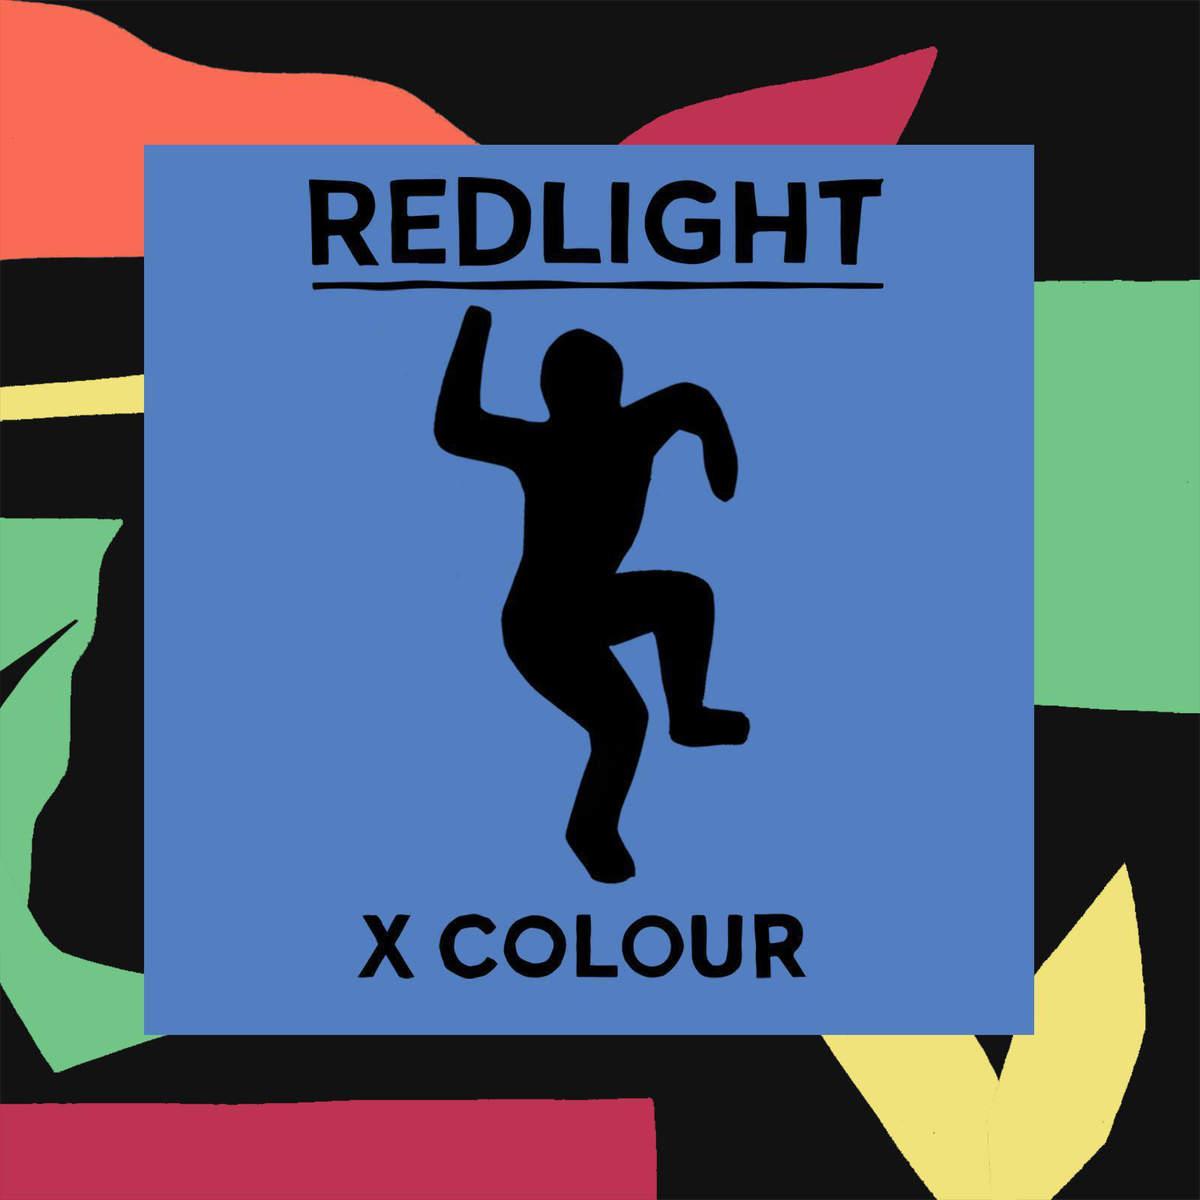 Redlight-X-Colour-2015-1200x1200